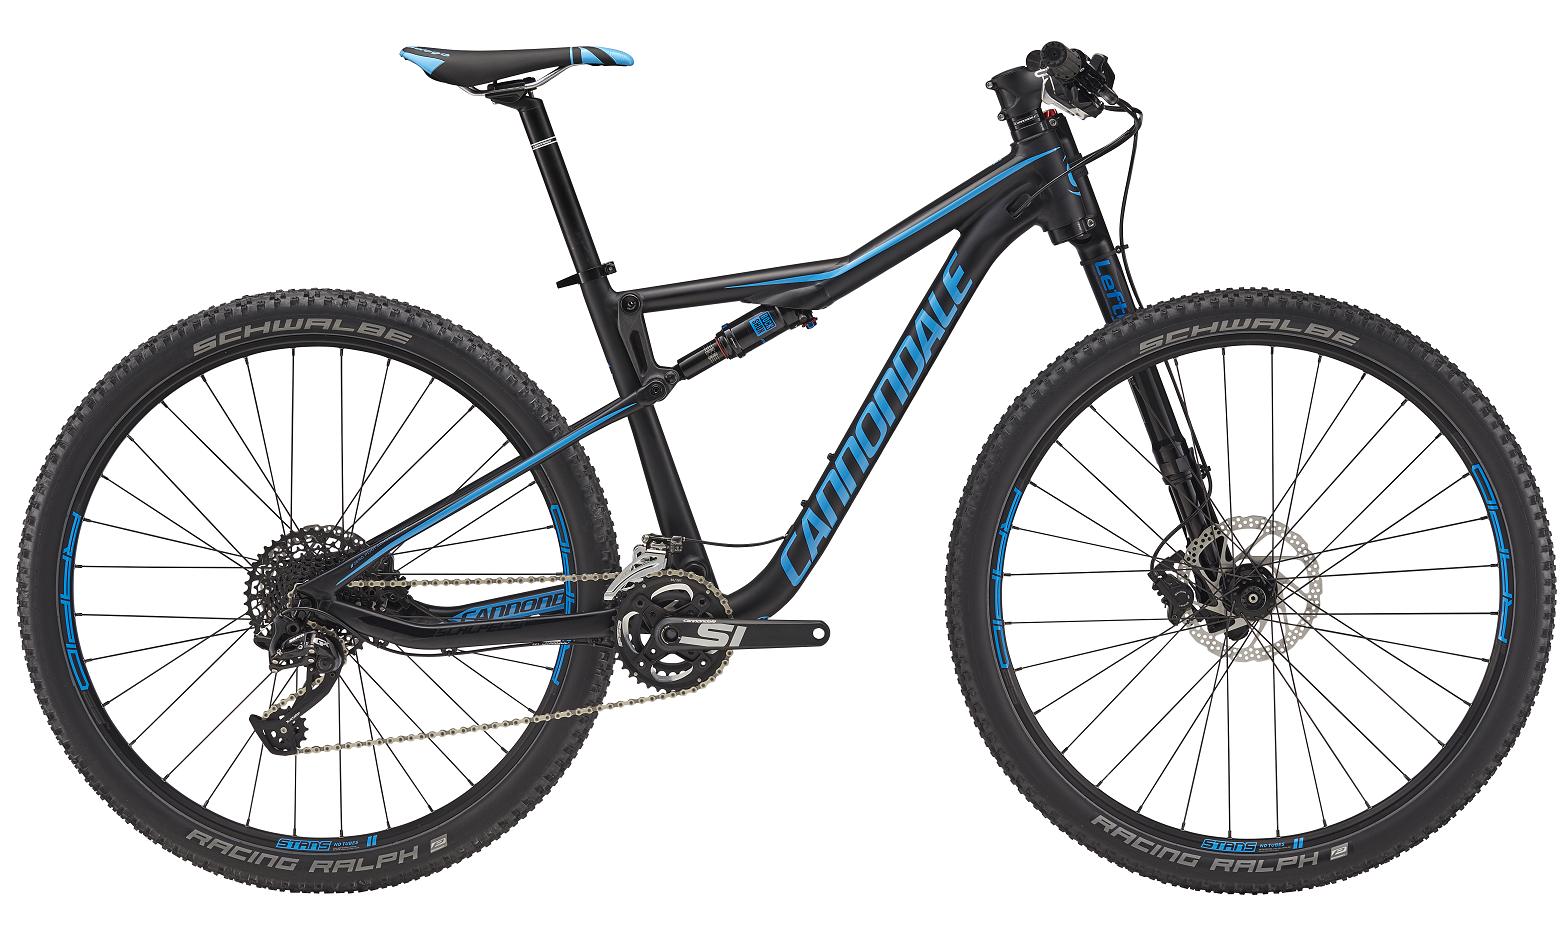 Bicicleta Cannondale Scalpel Si 5 2018 P 27,5 - BIKE ALLA CARTE